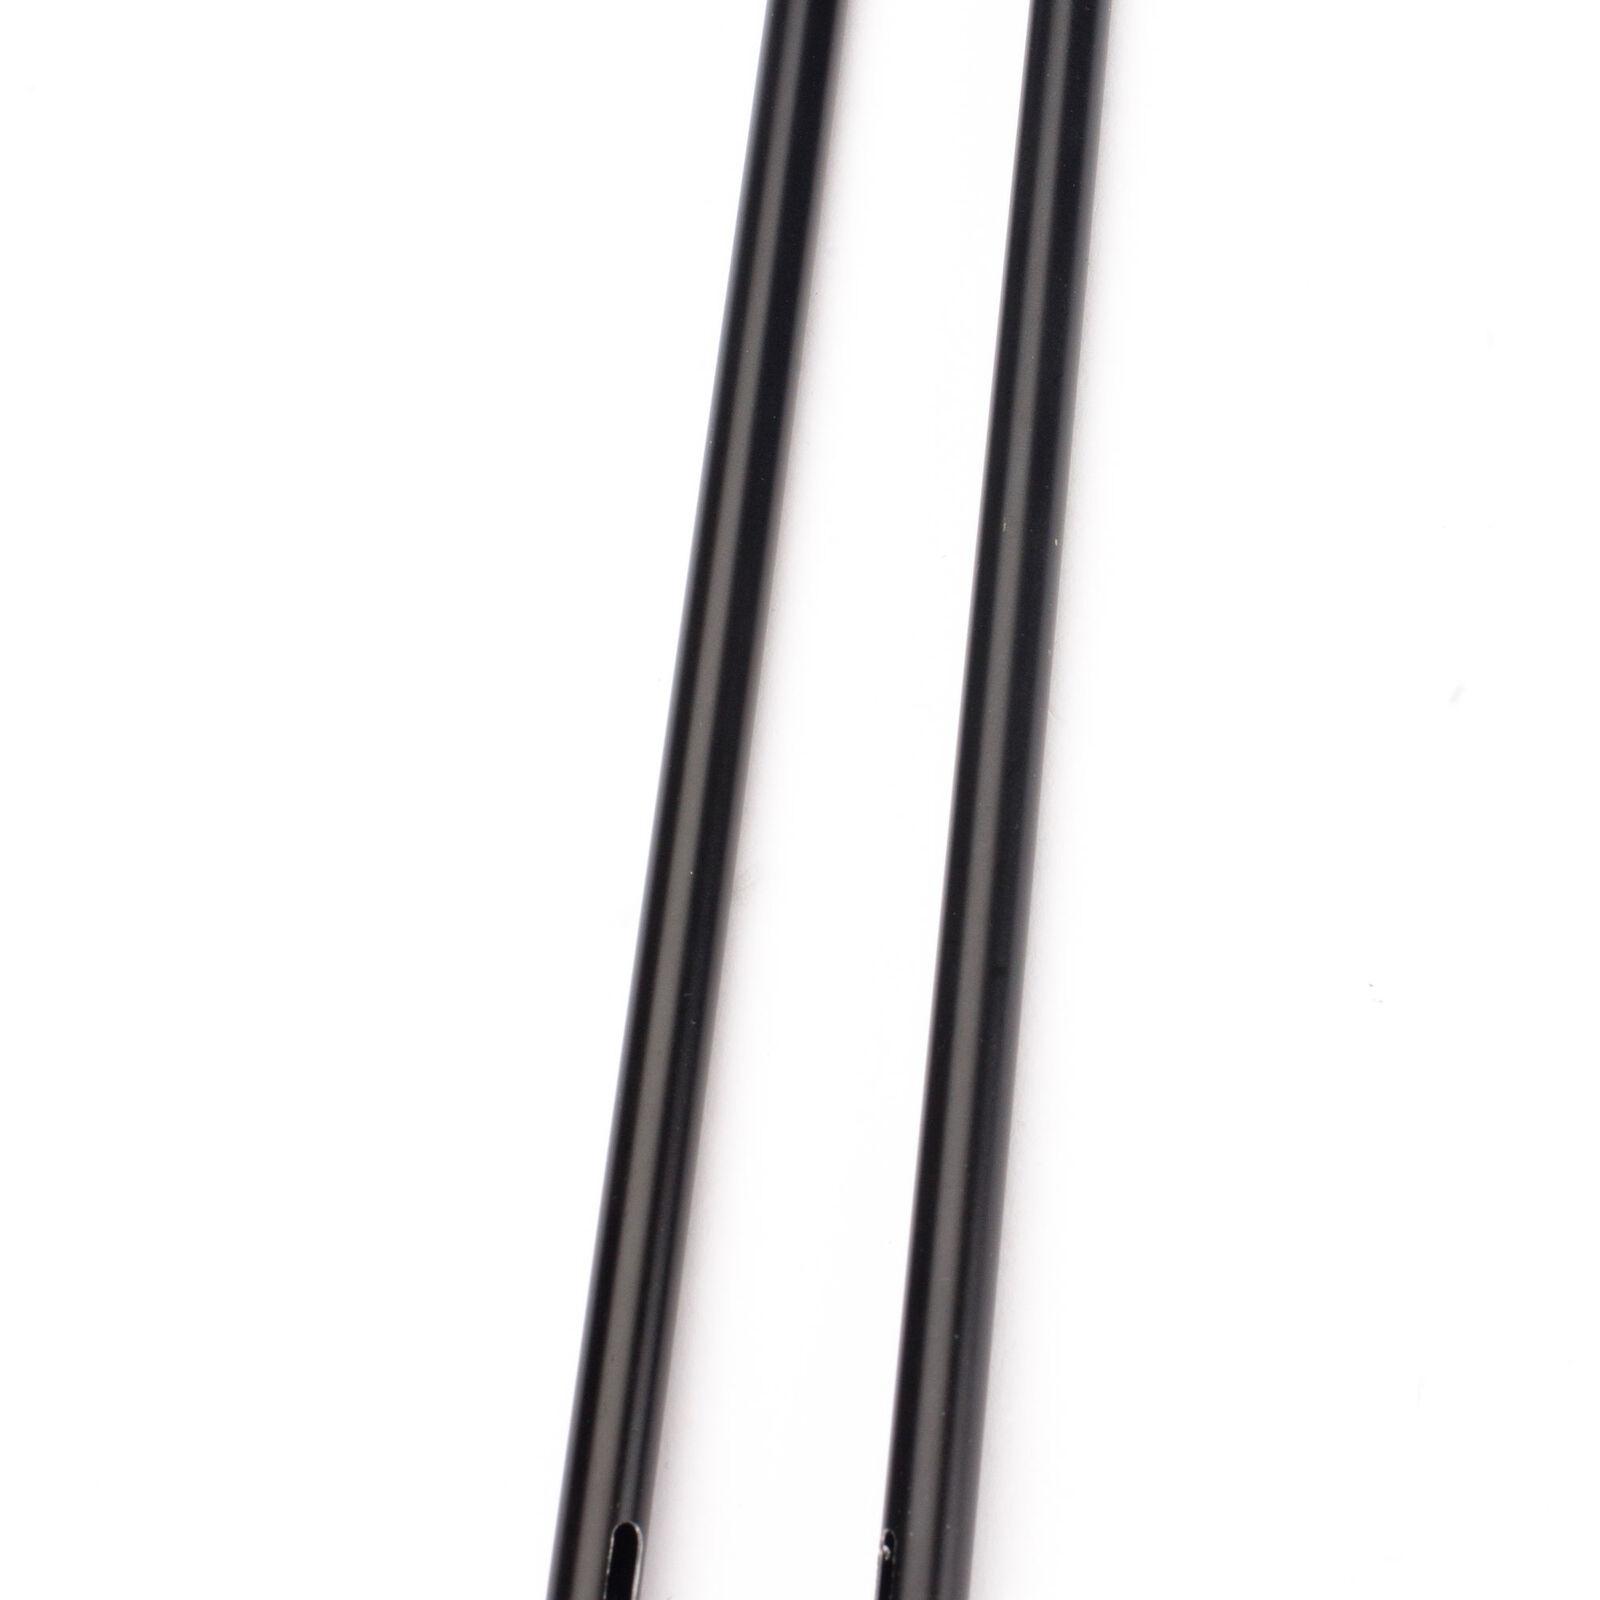 Tail Booms (2): 300 X